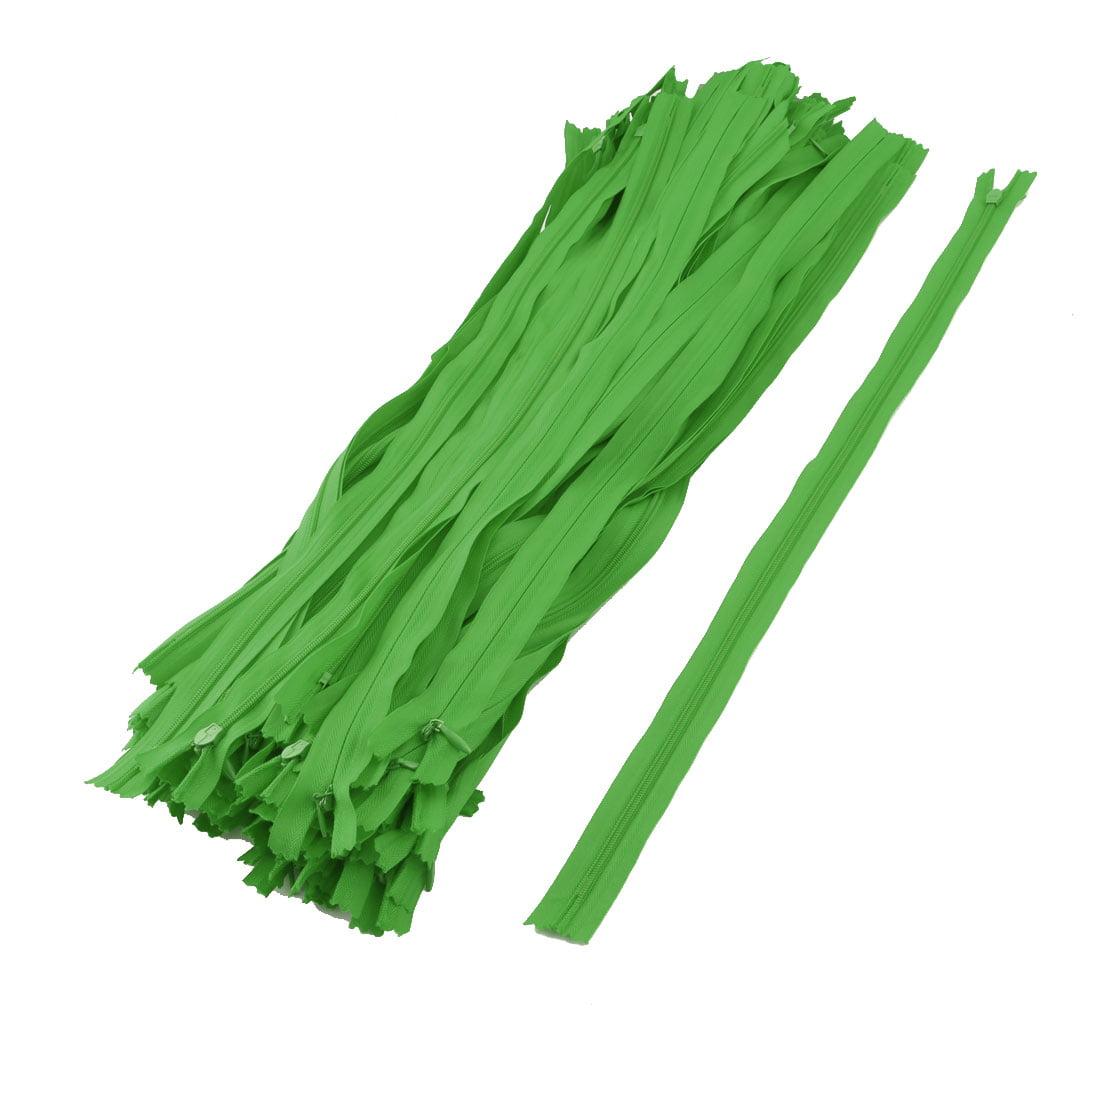 Dress Skirt Pants Invisible Zipper Sewing Craft Tool Green 20 Inch Length 100pcs